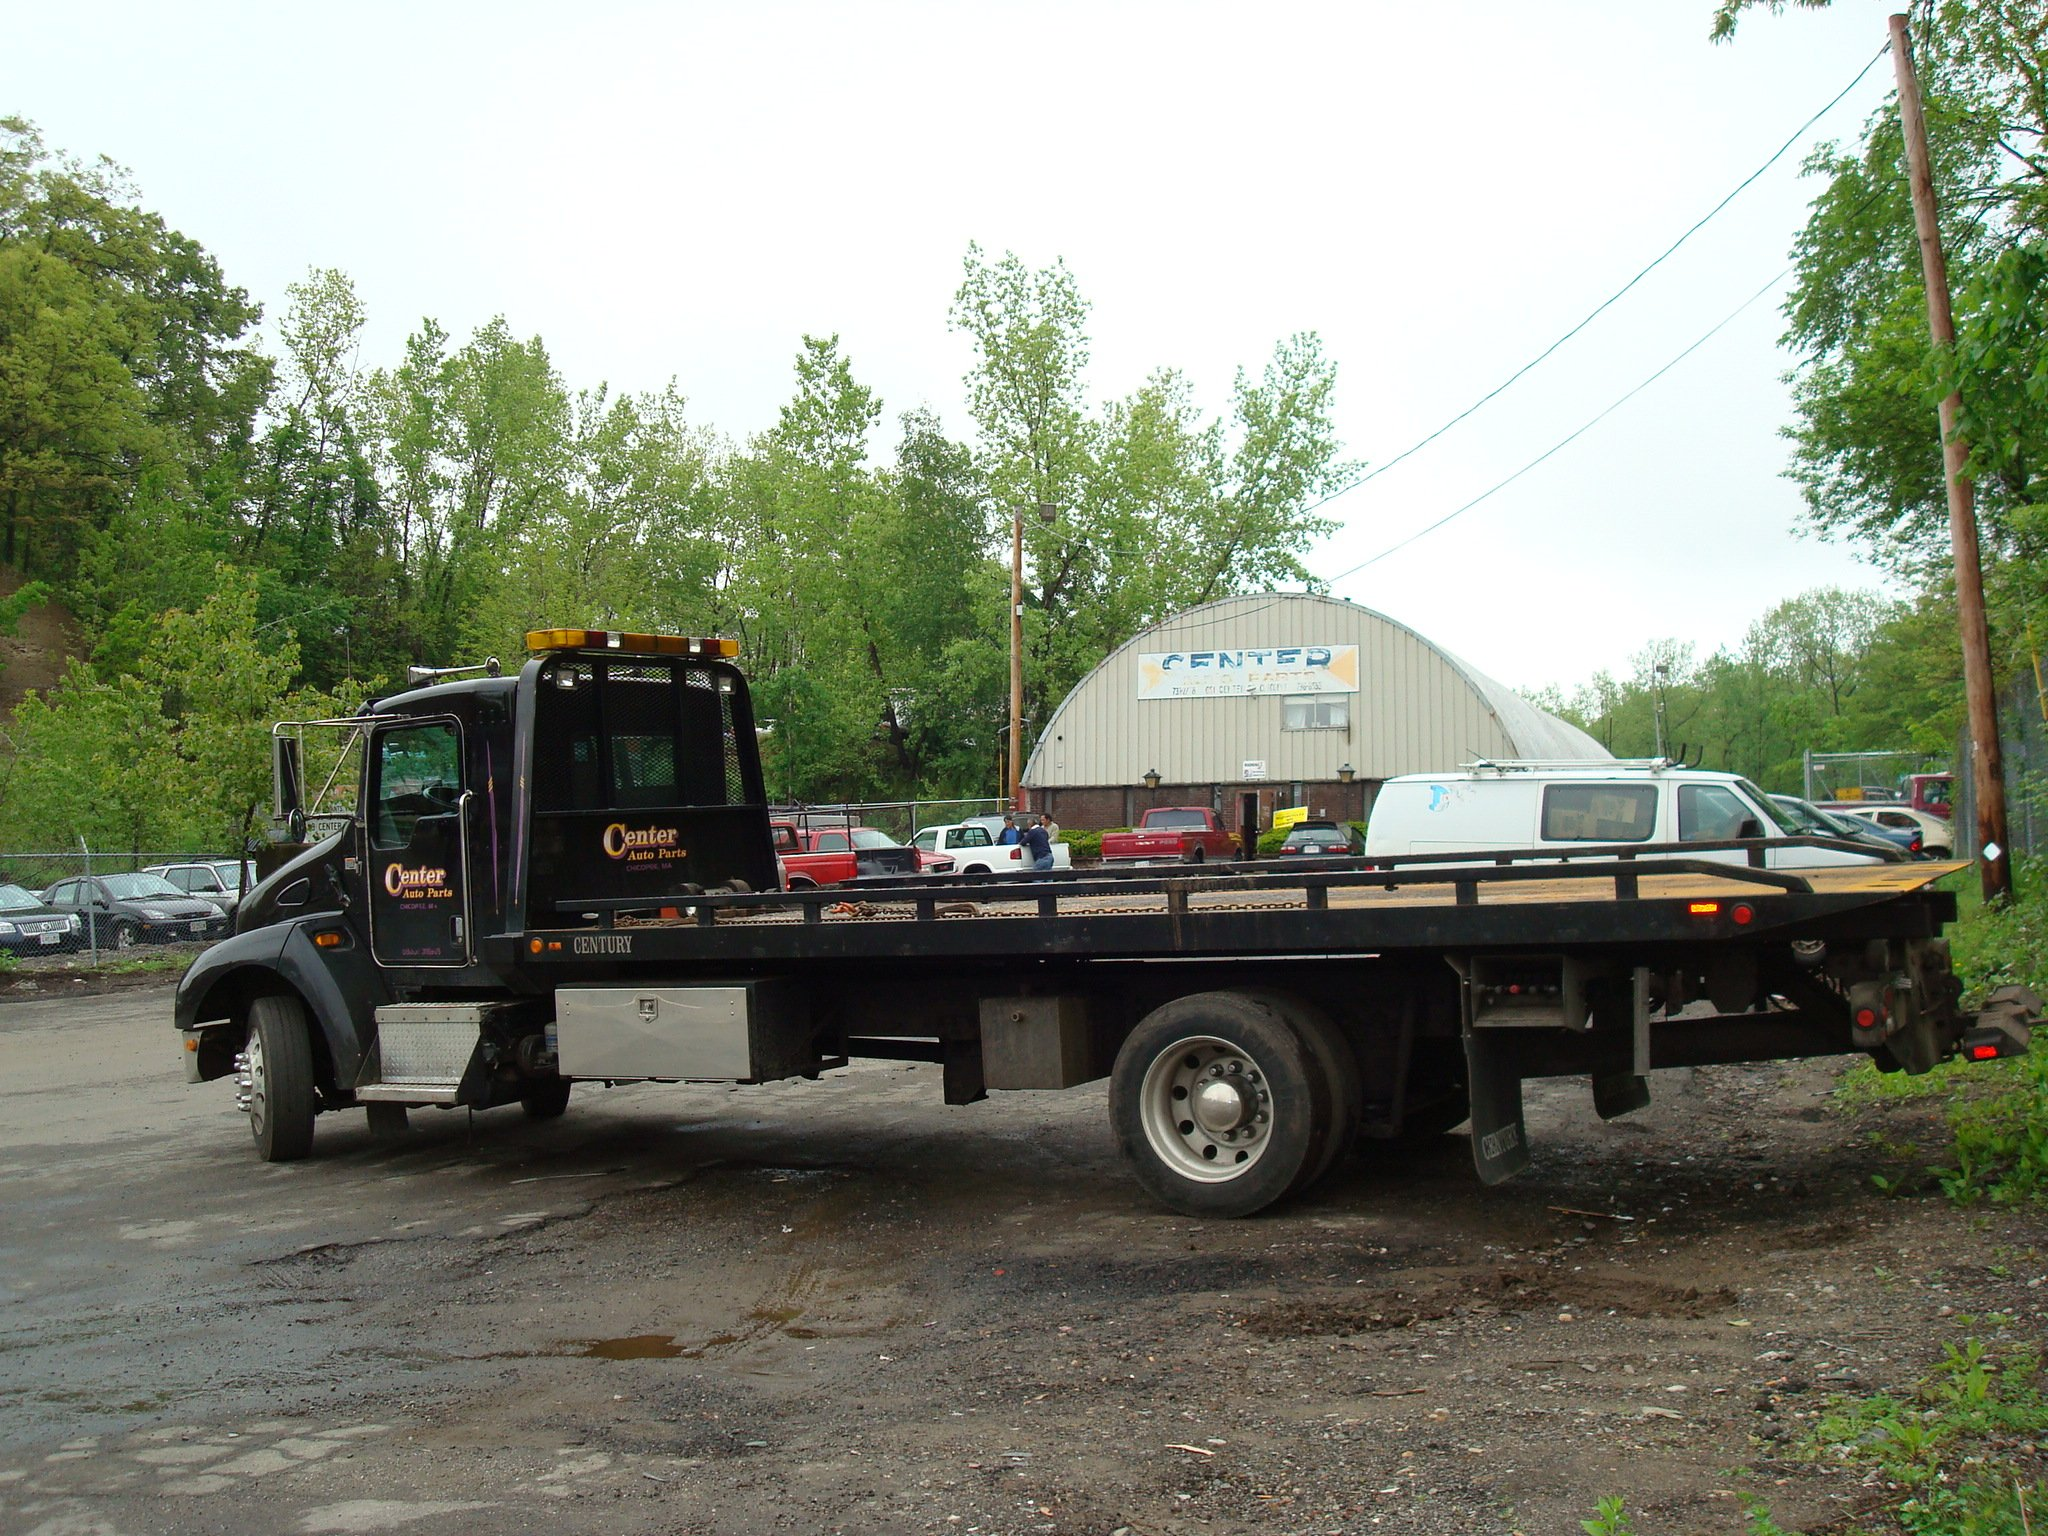 Used Cars | Foreign | Domestic Cars | Chicopee, MA | Springfield, MA